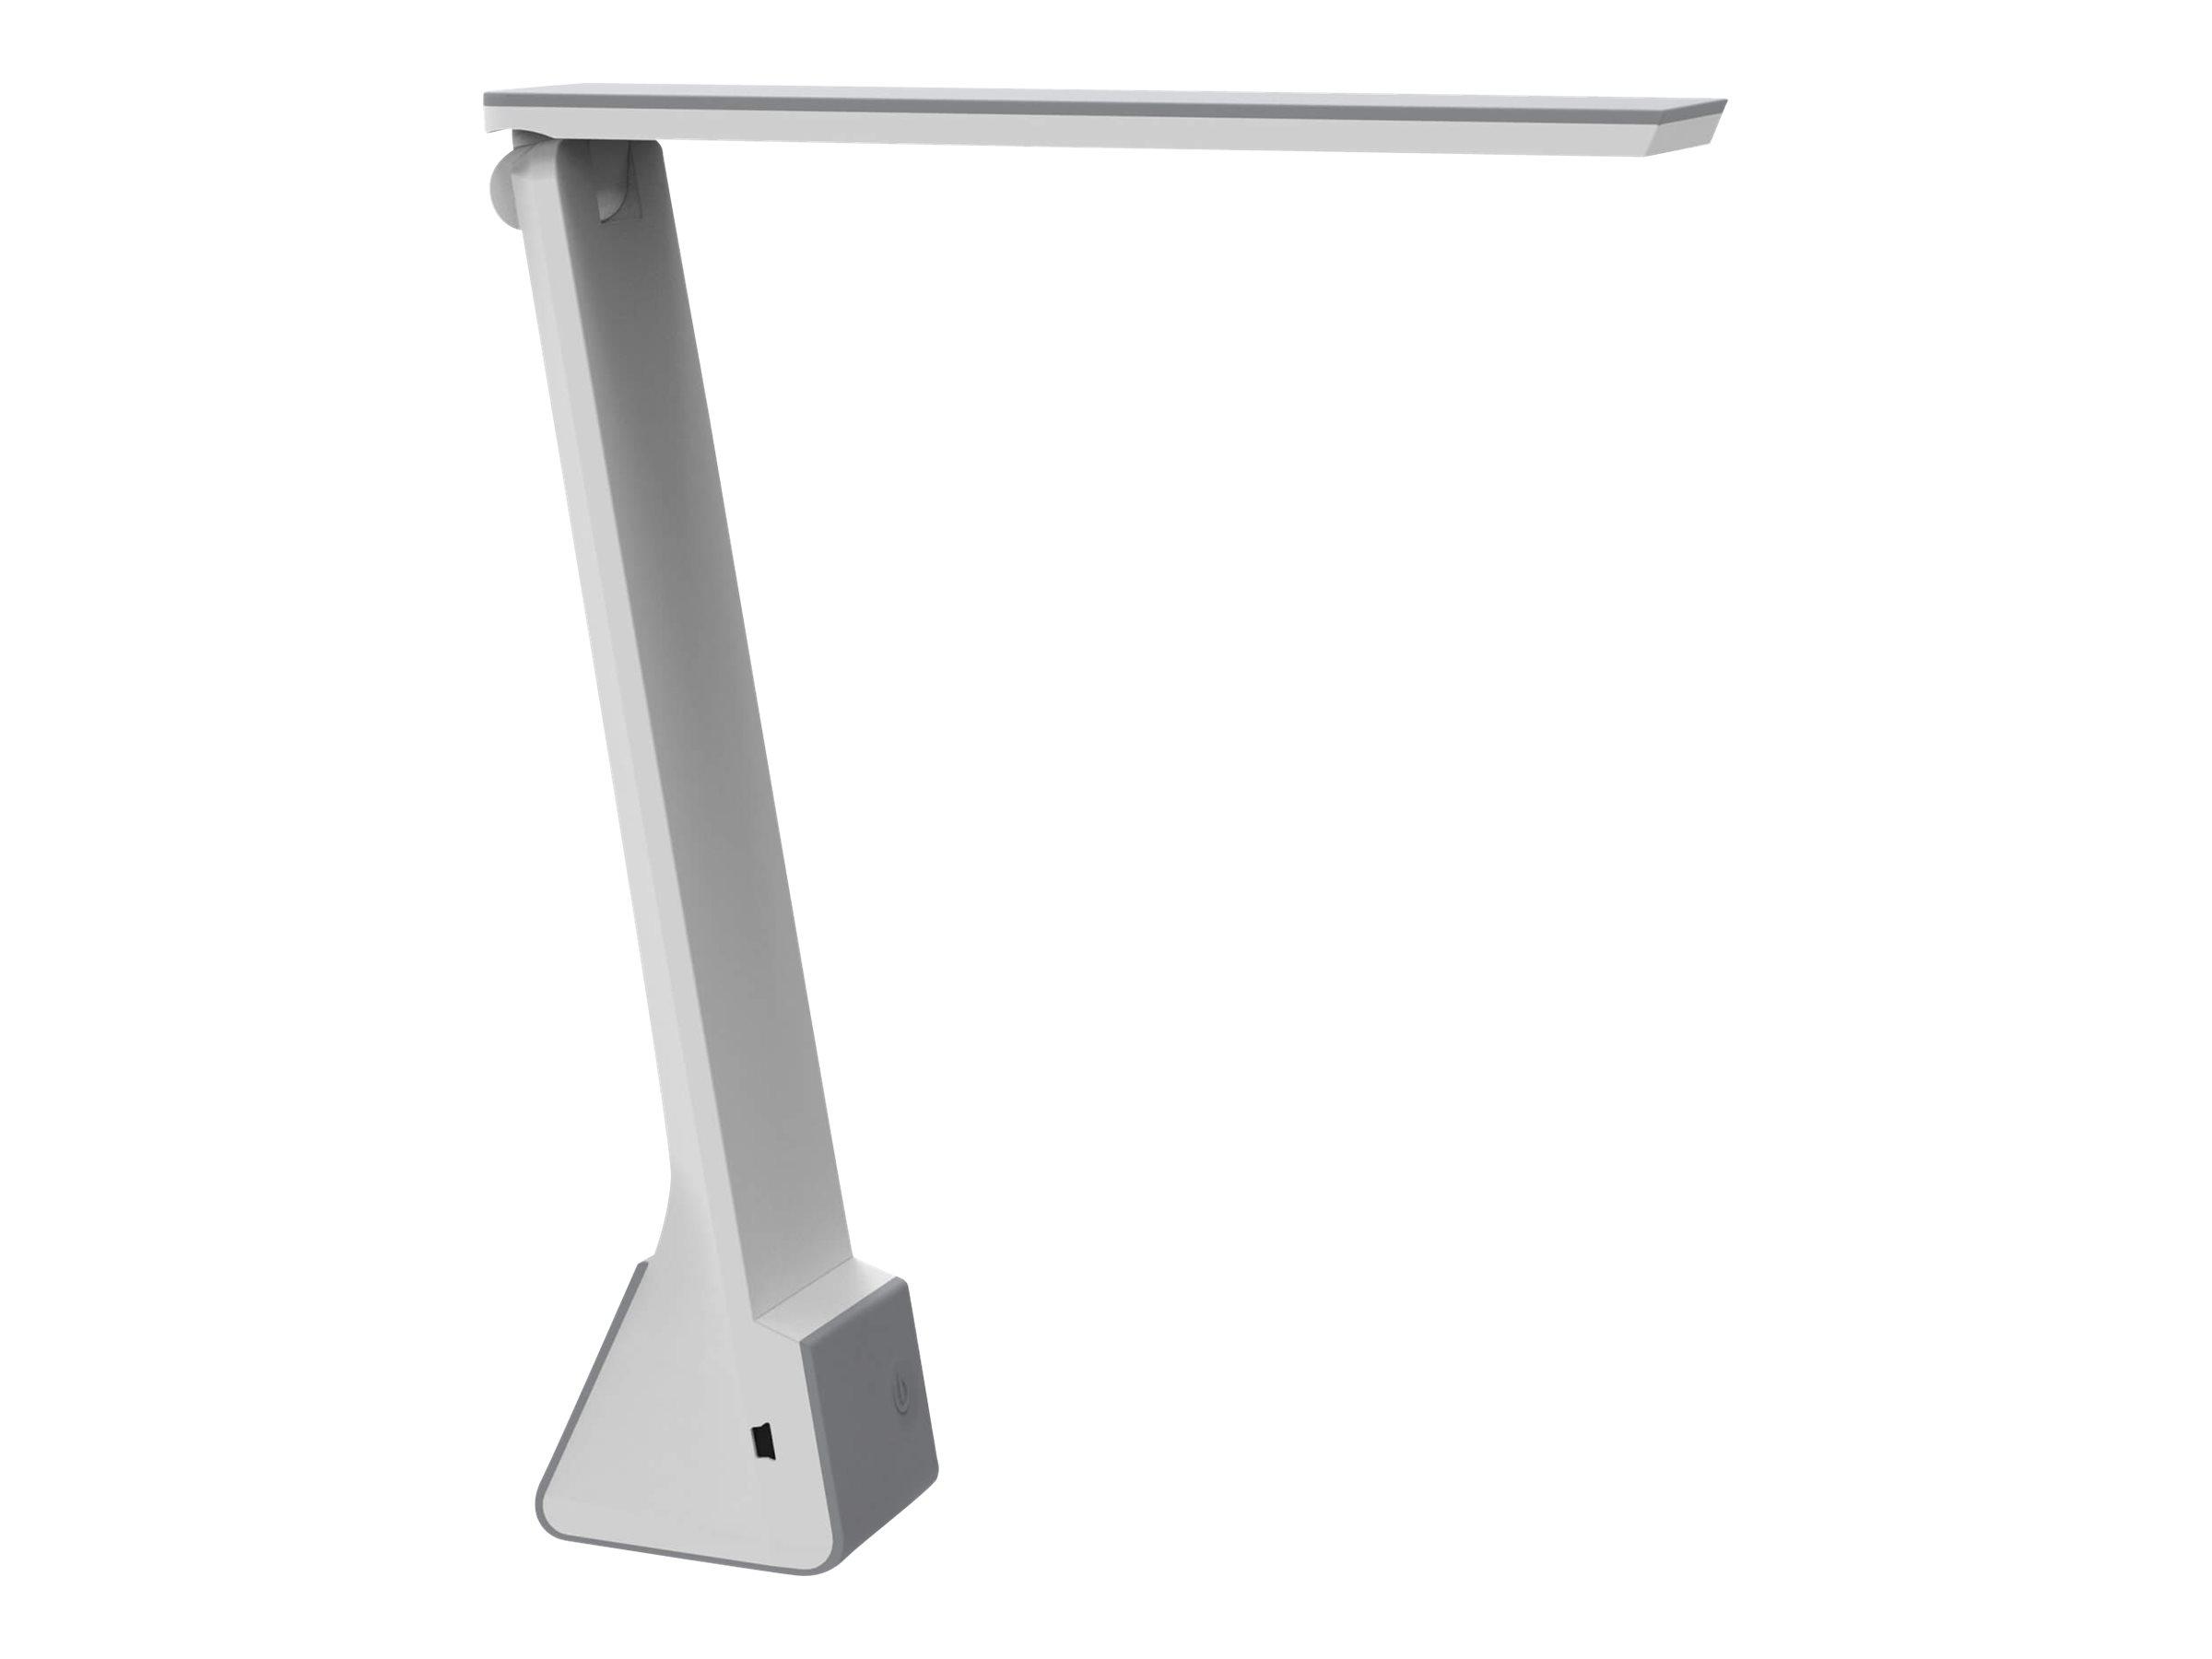 MAULseven - Lampe de bureau - LED - gris